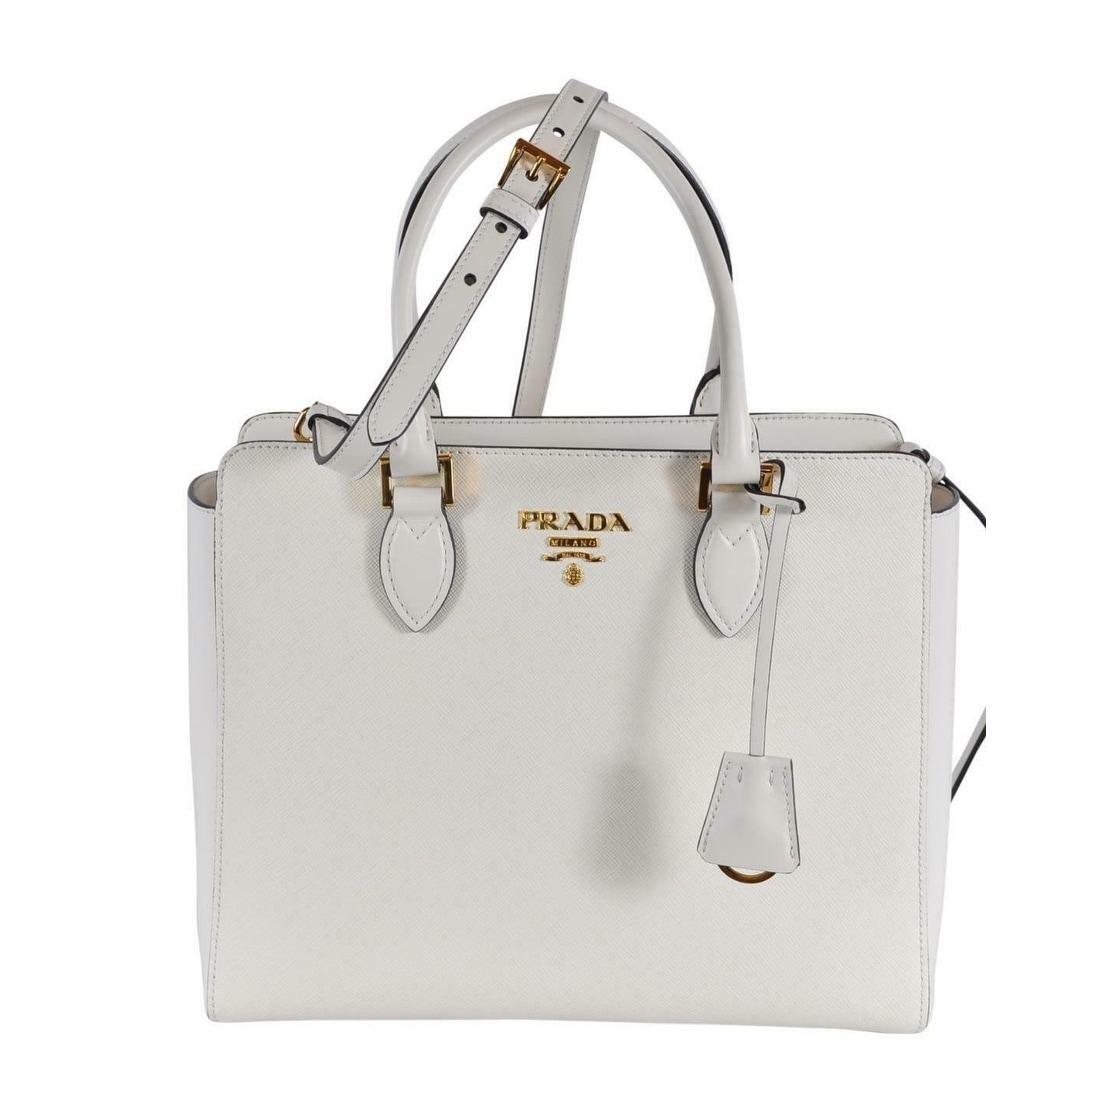 Prada 1ba189 Borsa A Mano Bianco White Saffiano Leather 2 Way Purse Tote Bag Off